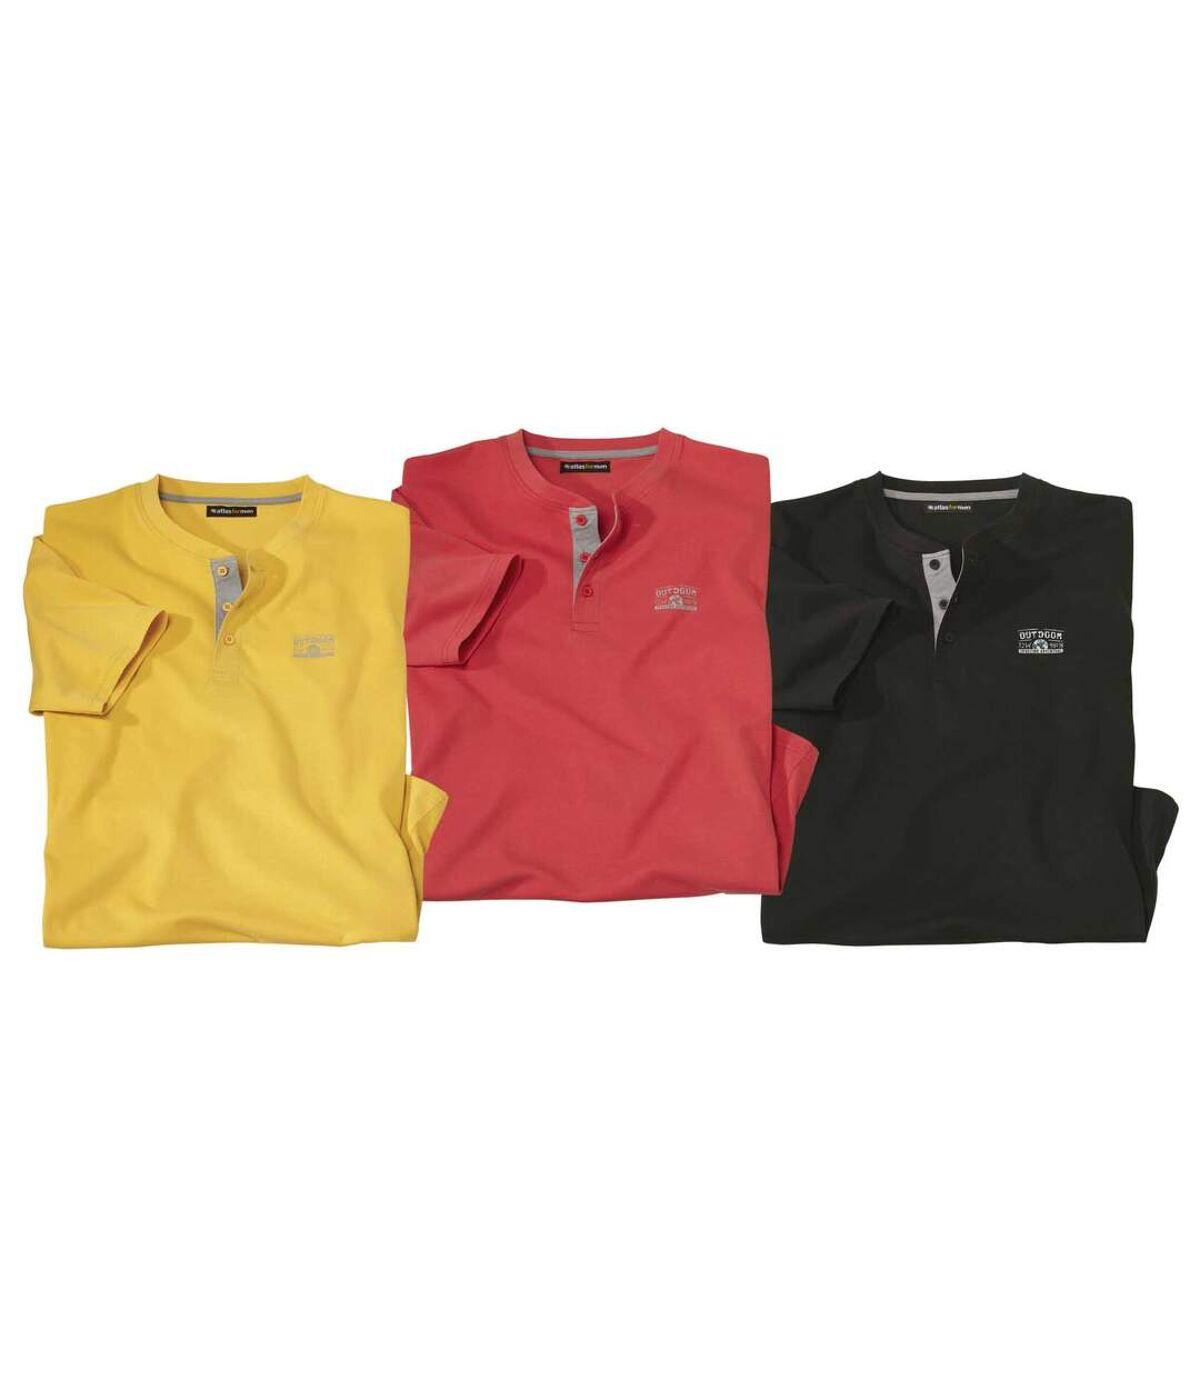 3er-Pack Henley-Shirts Outdoor Atlas For Men